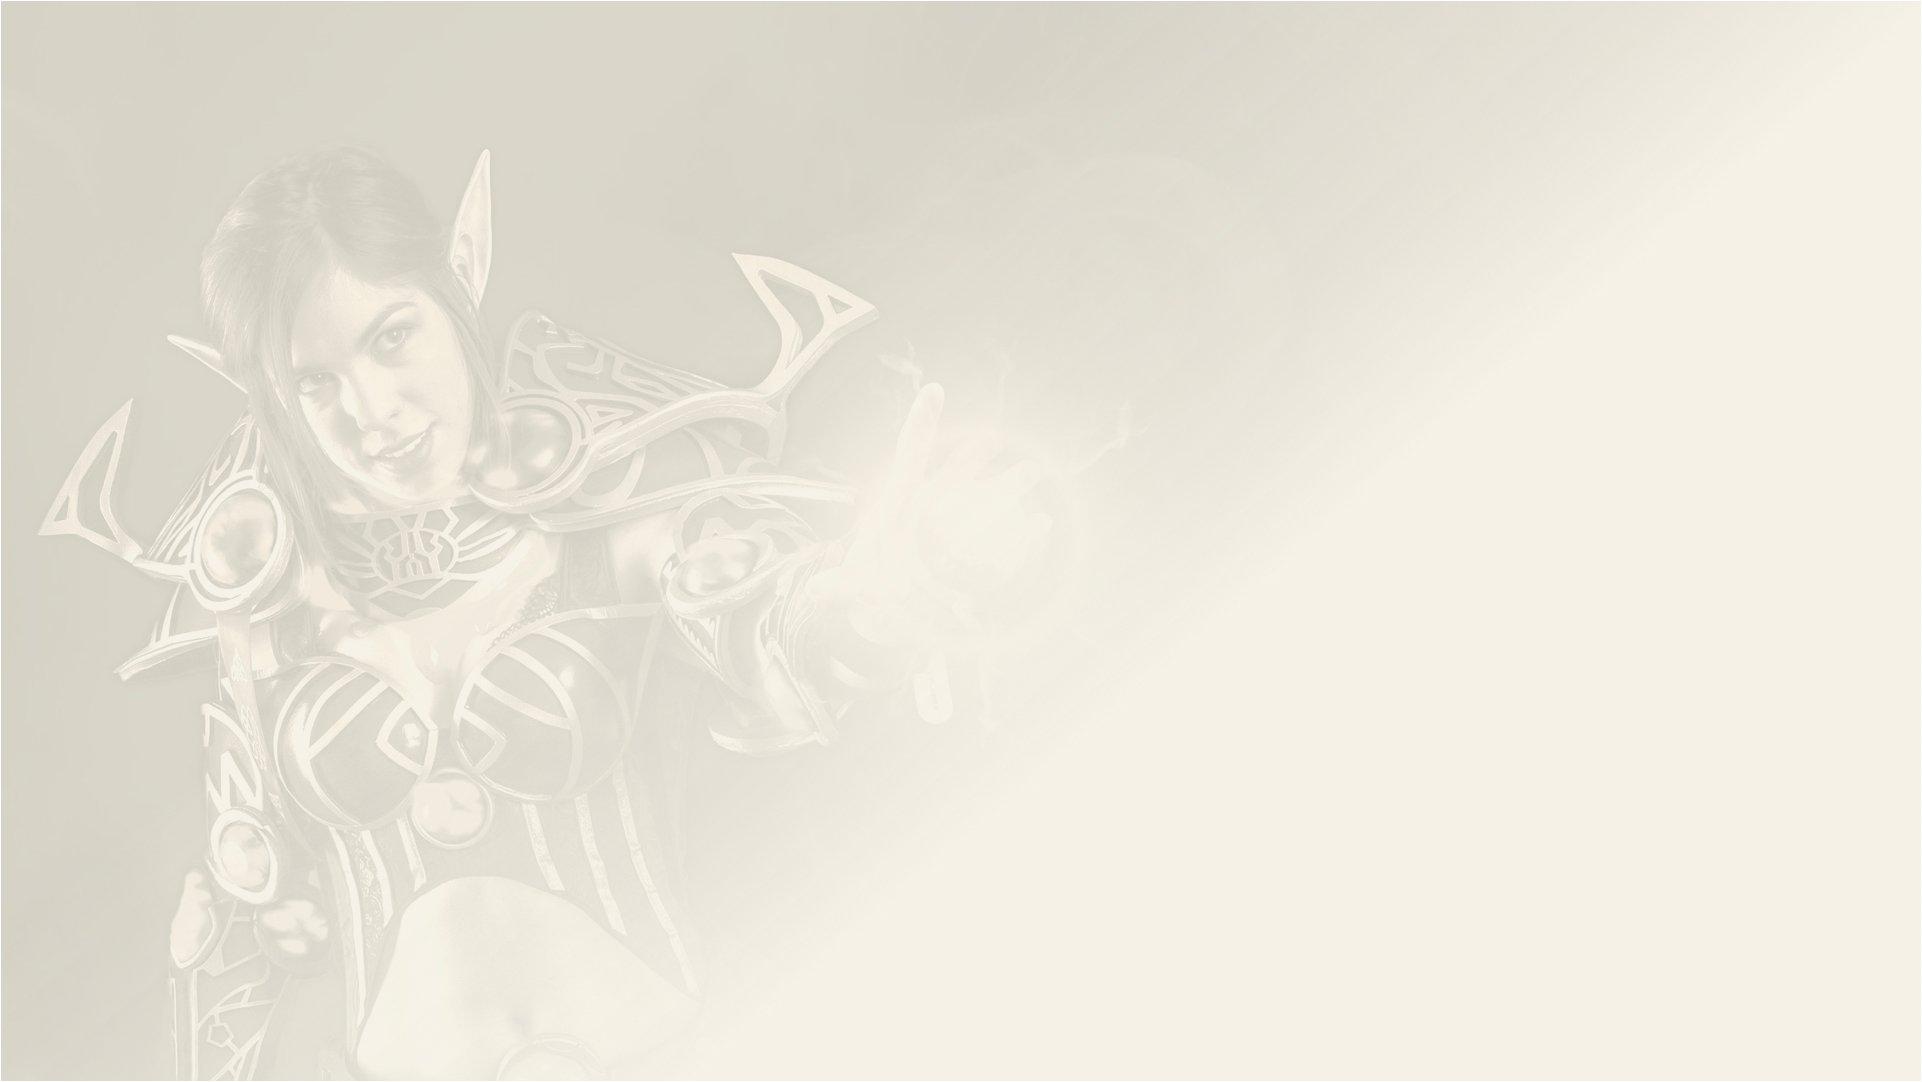 Cosplay-BloodElf-Background2-f2eee2-min